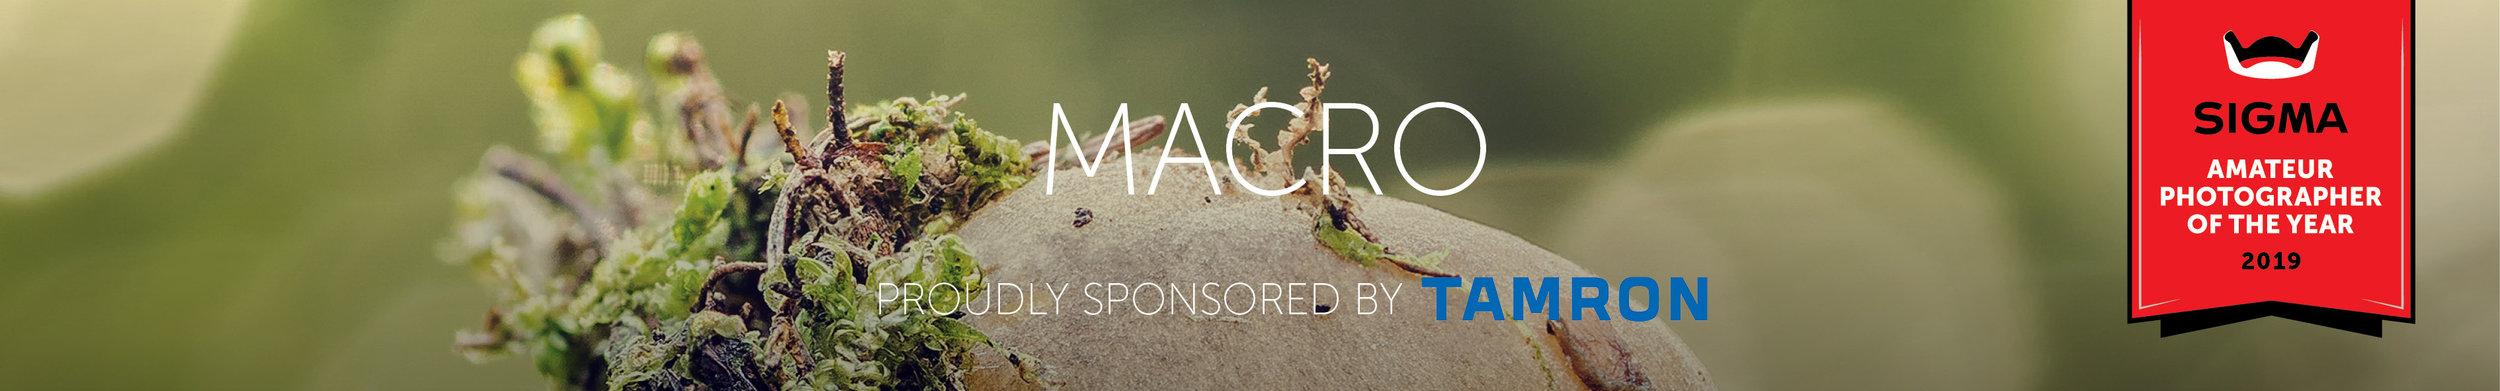 Macro 320x50px.jpg